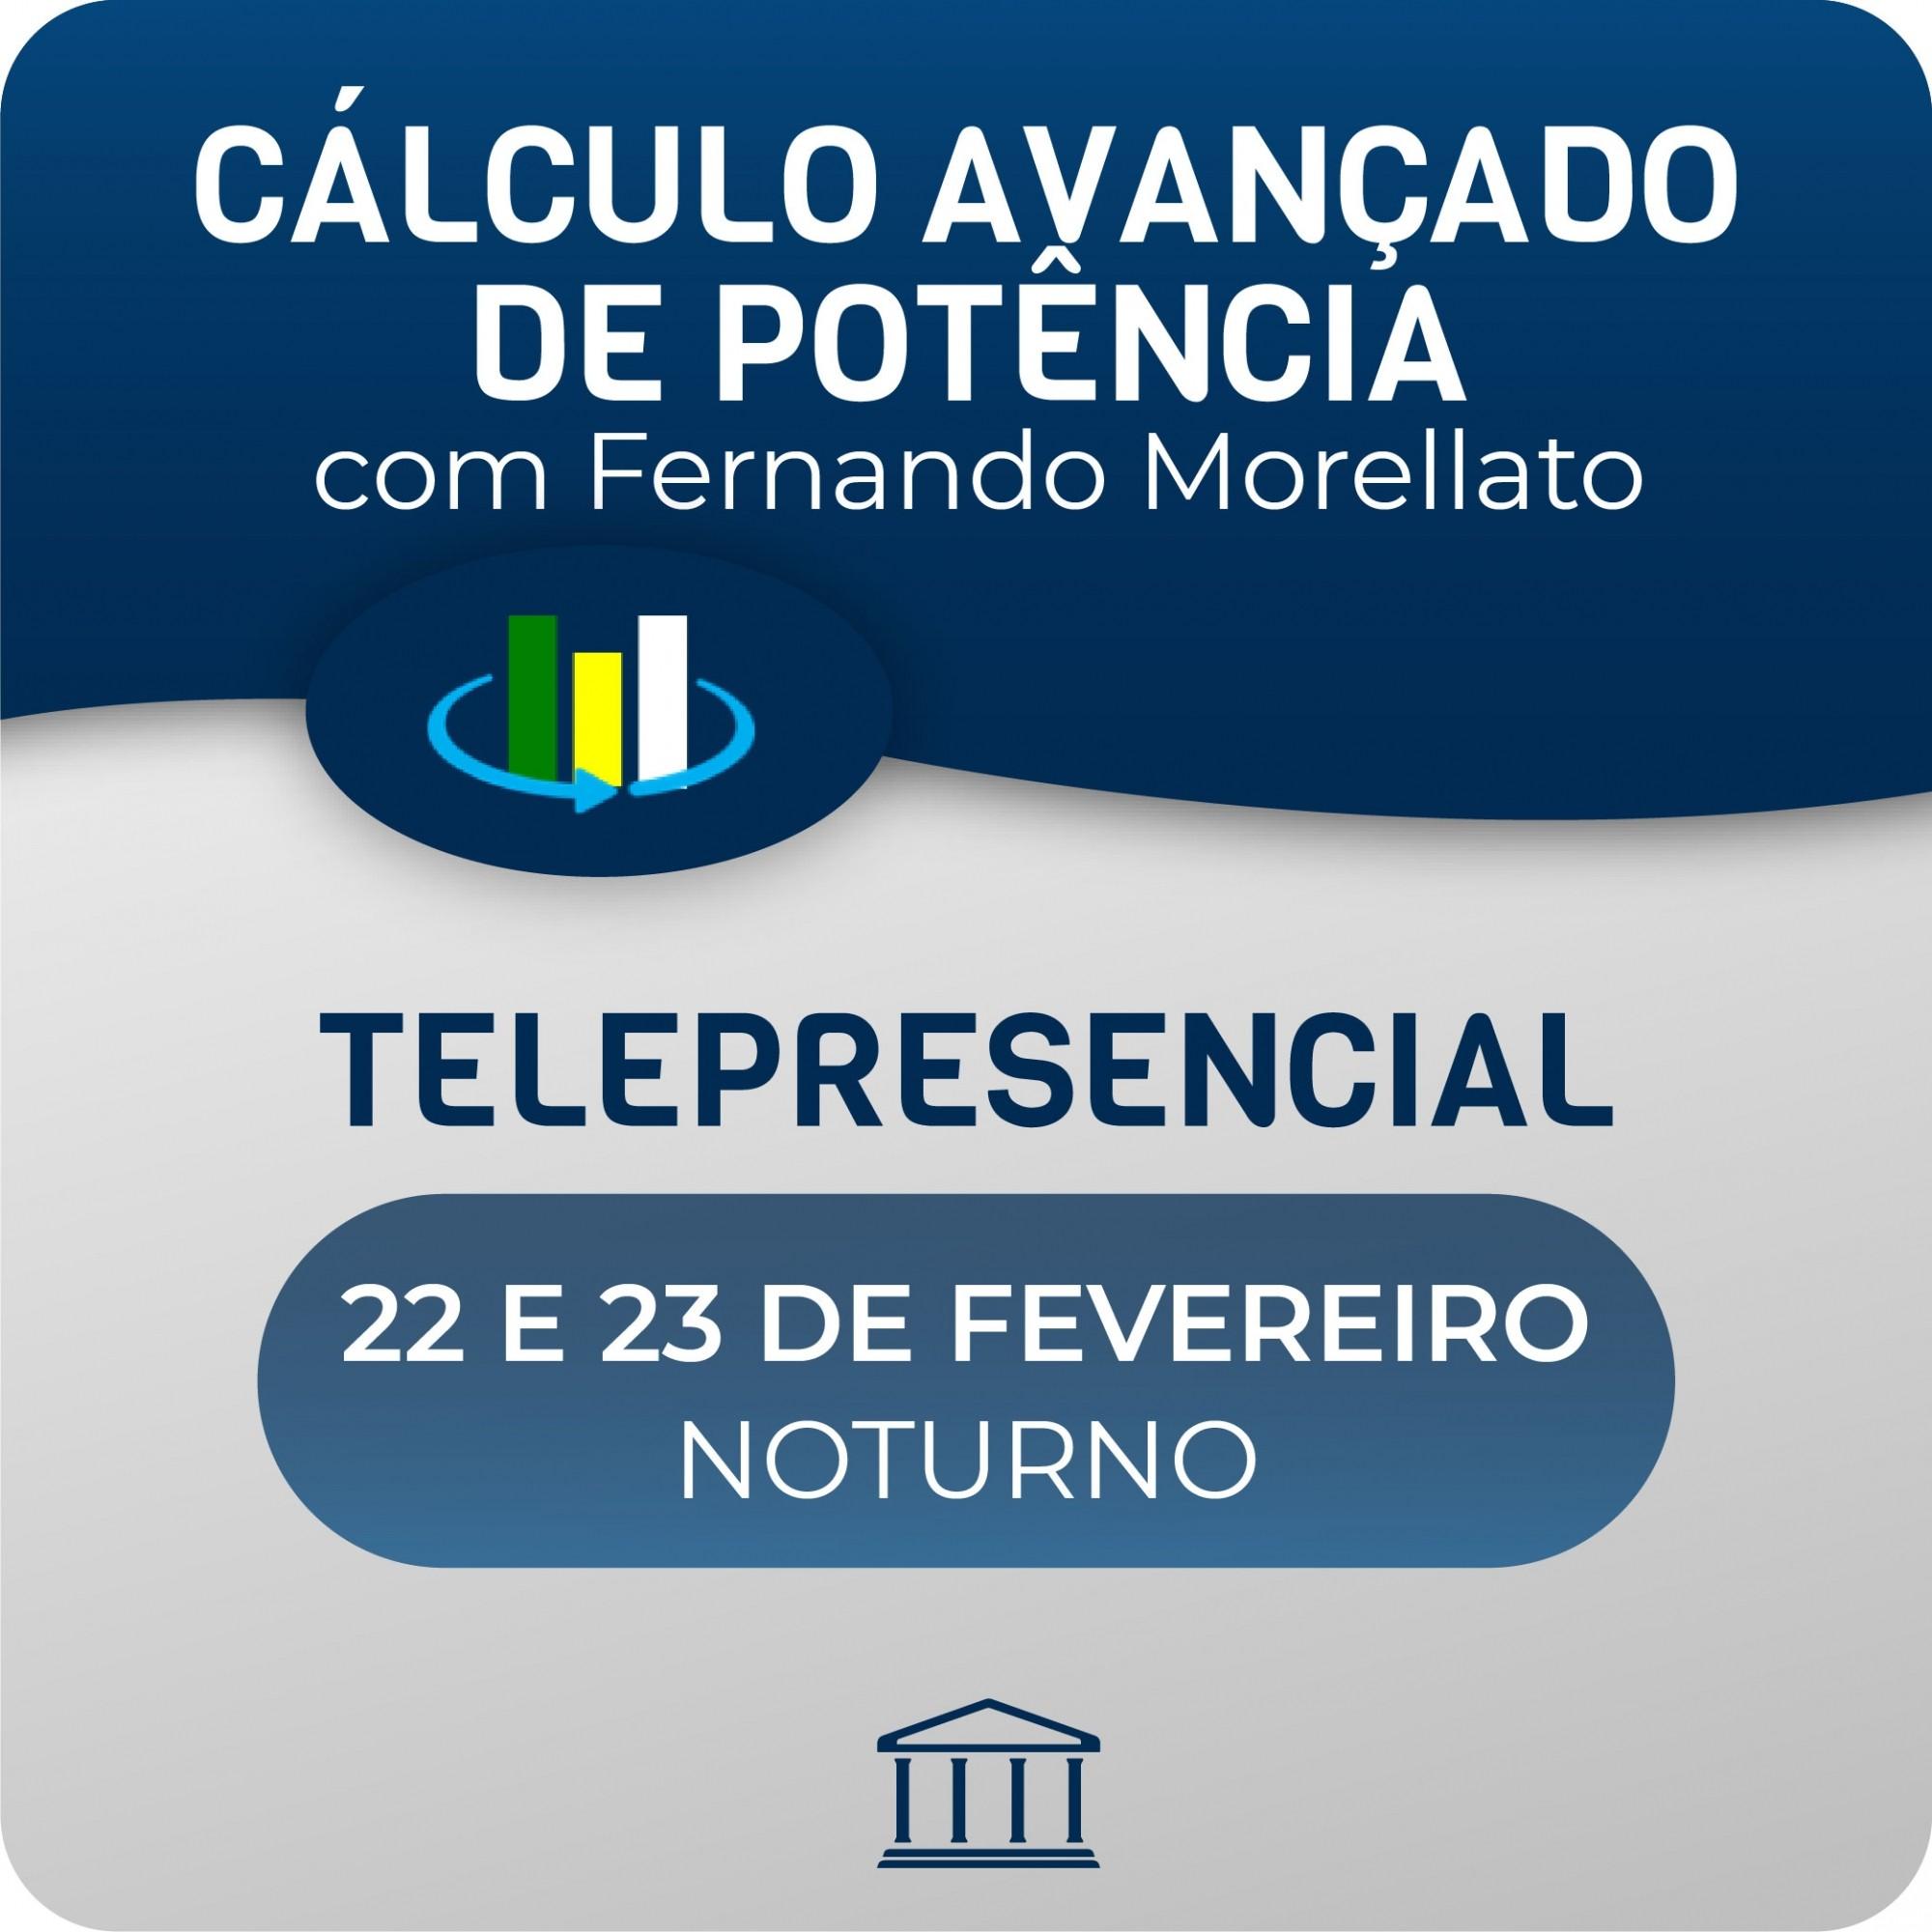 Curso Avançado de Cálculo de Potência Óptica  - CACP  - Voz e Dados